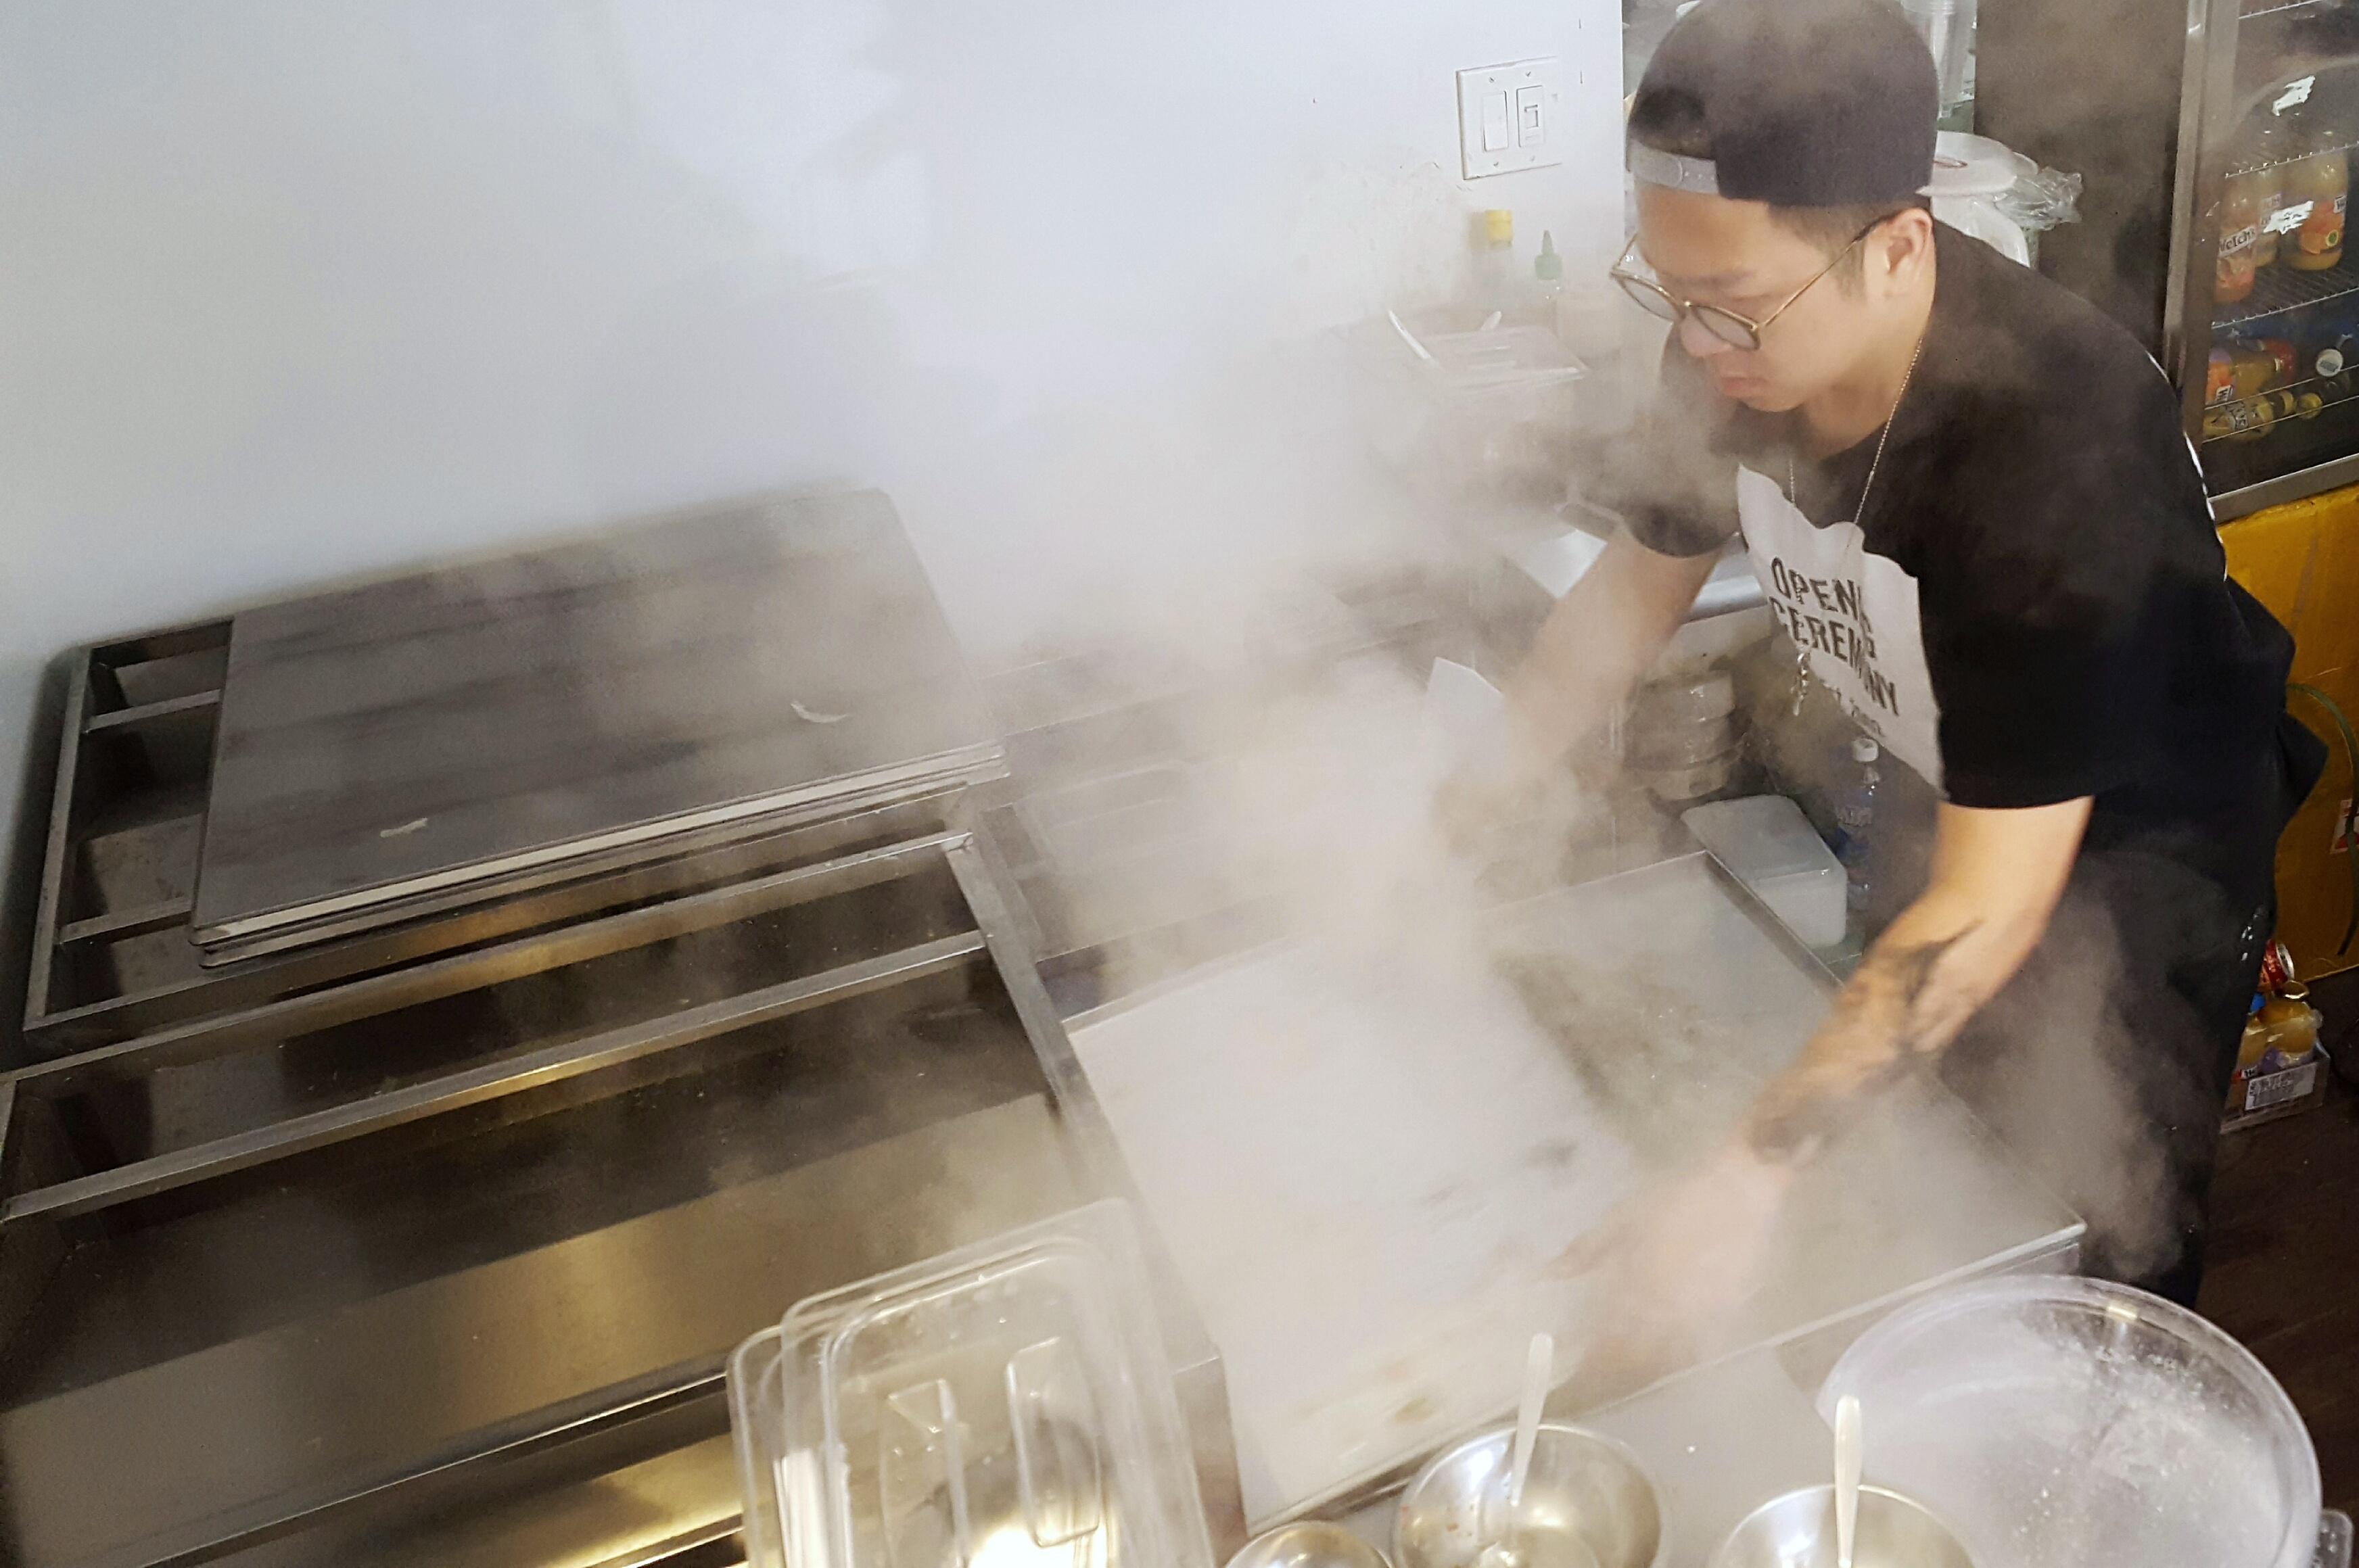 Joe Rong of Joe's Steam Rice Roll